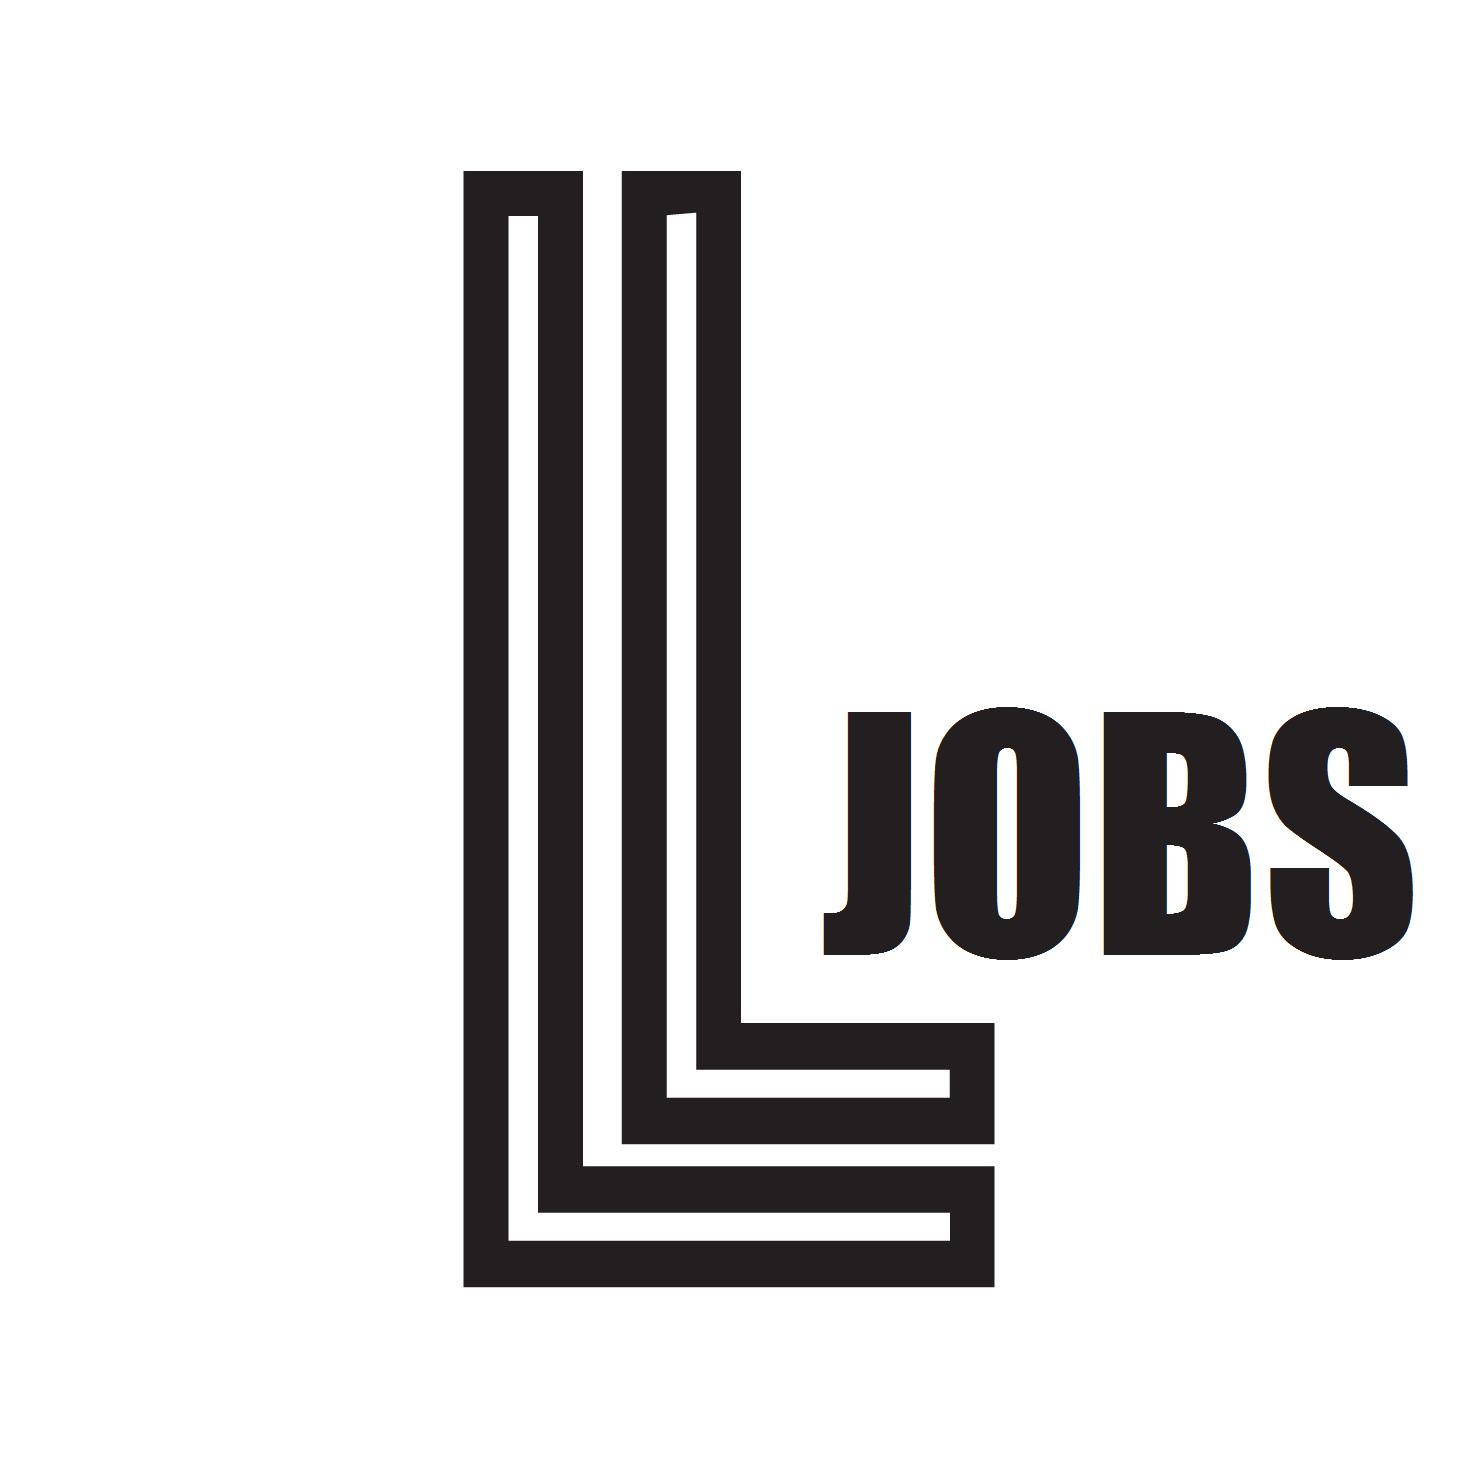 Lex_Line_Jobs_Image-1